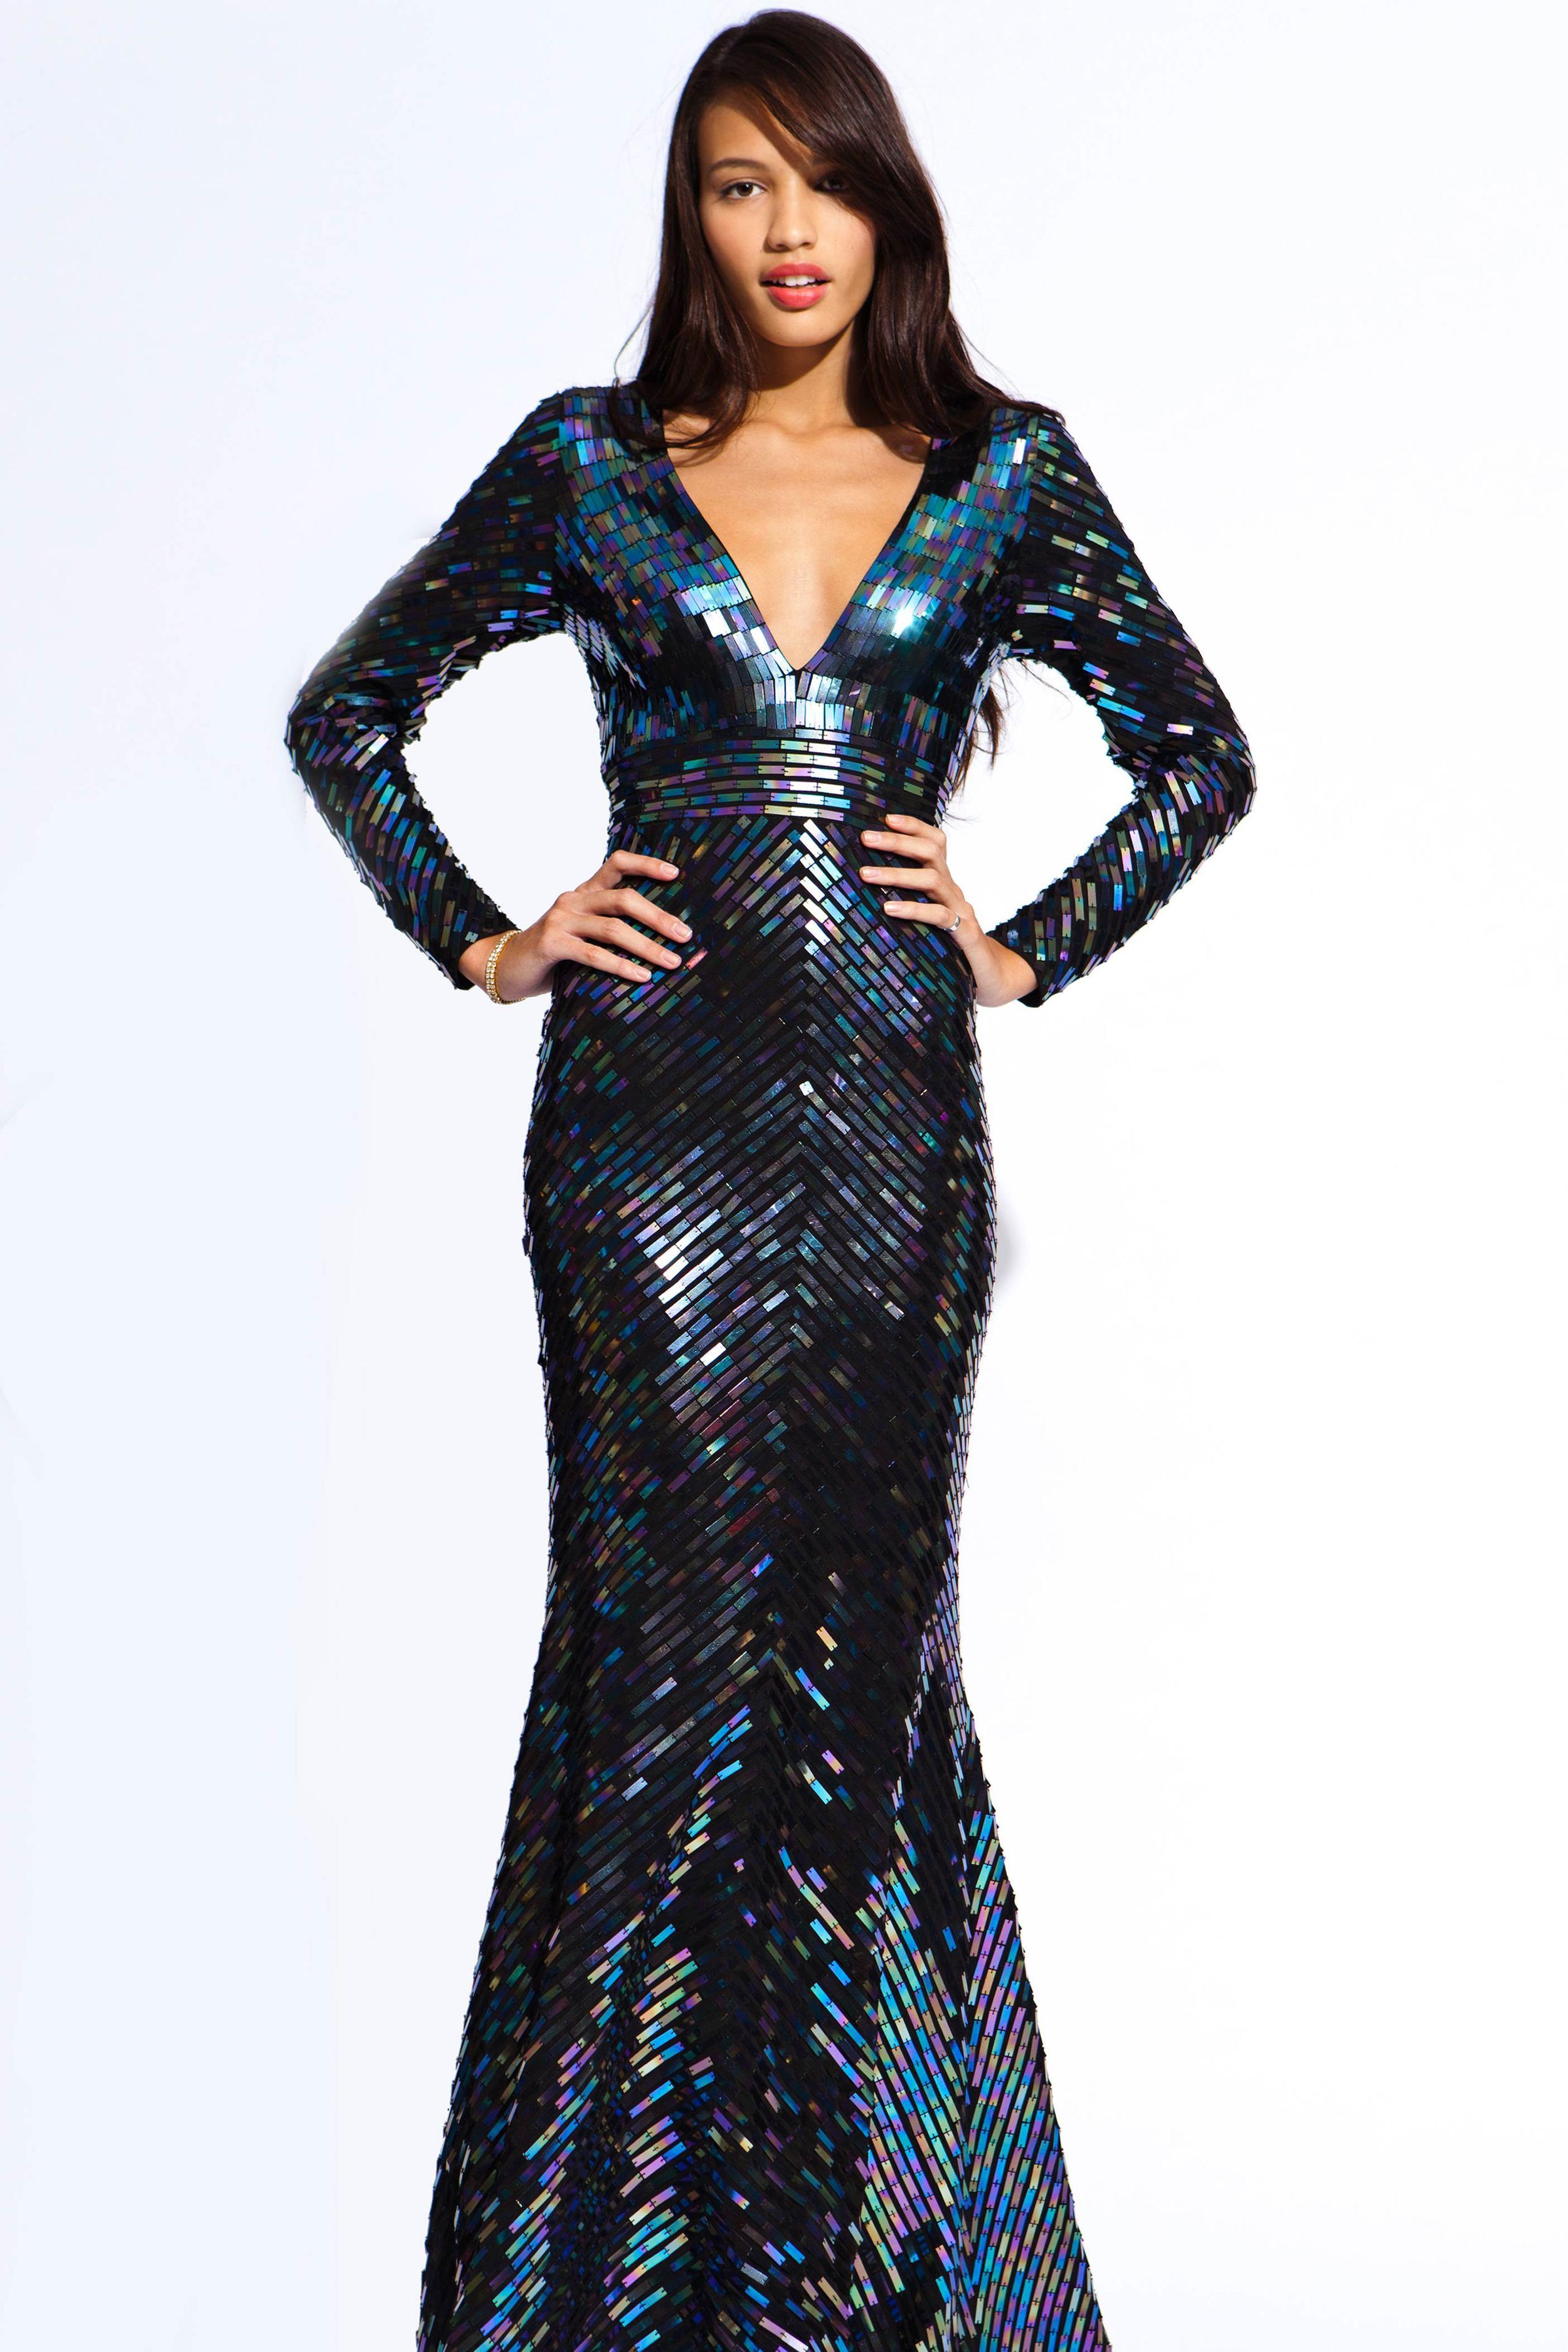 jovani-evening-dress-77592.jpg